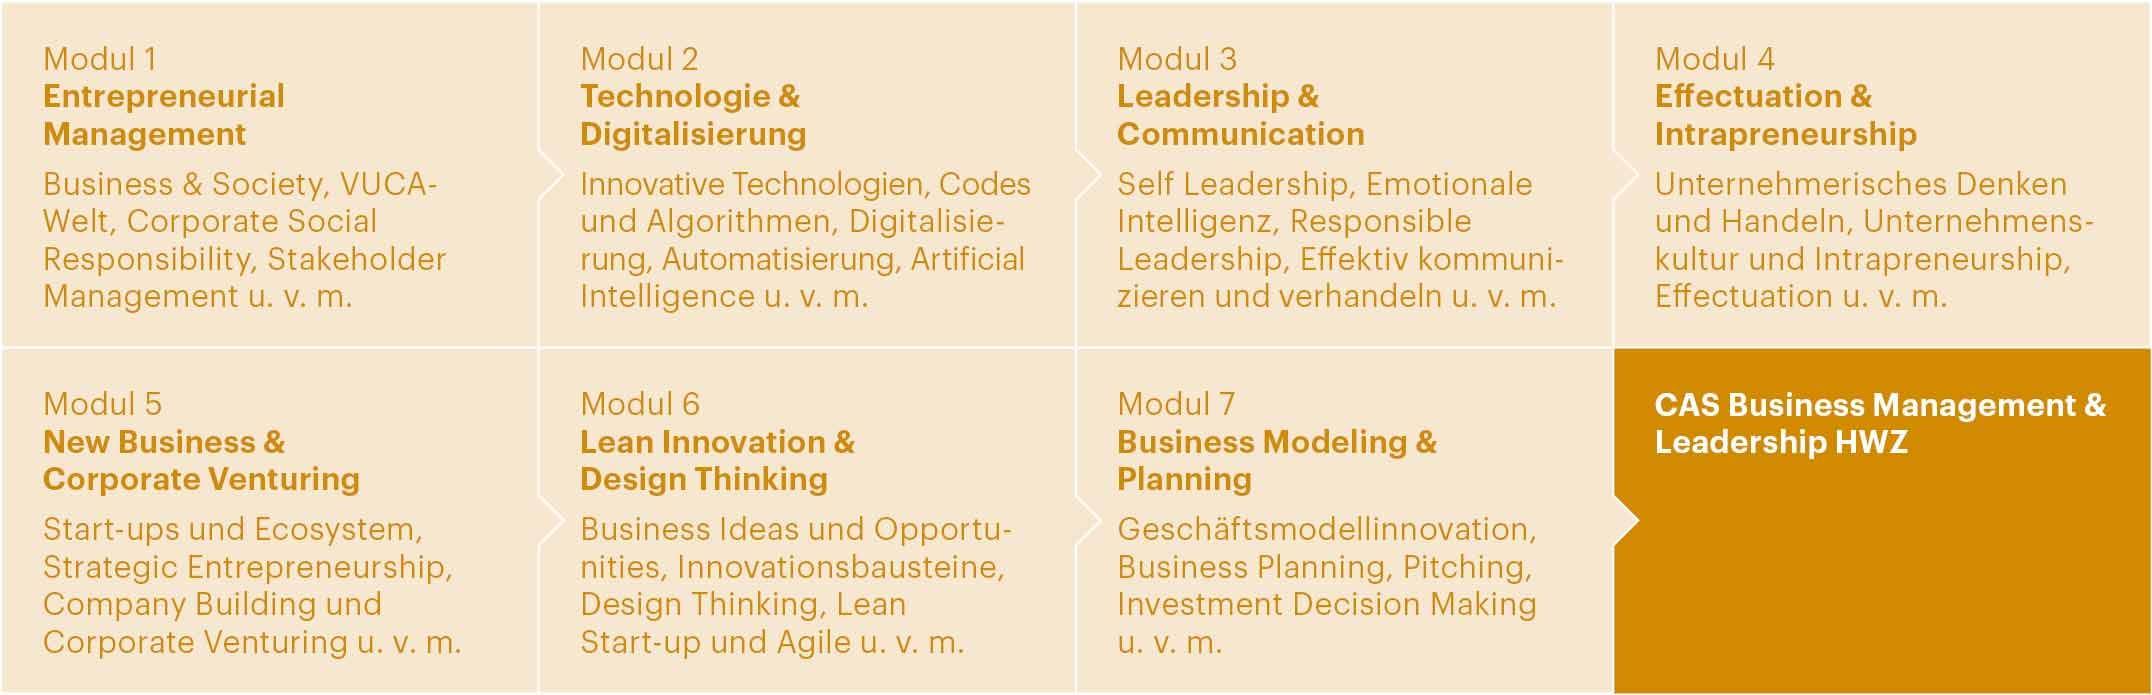 Aufbau CAS Business Management & Leadership HWZ